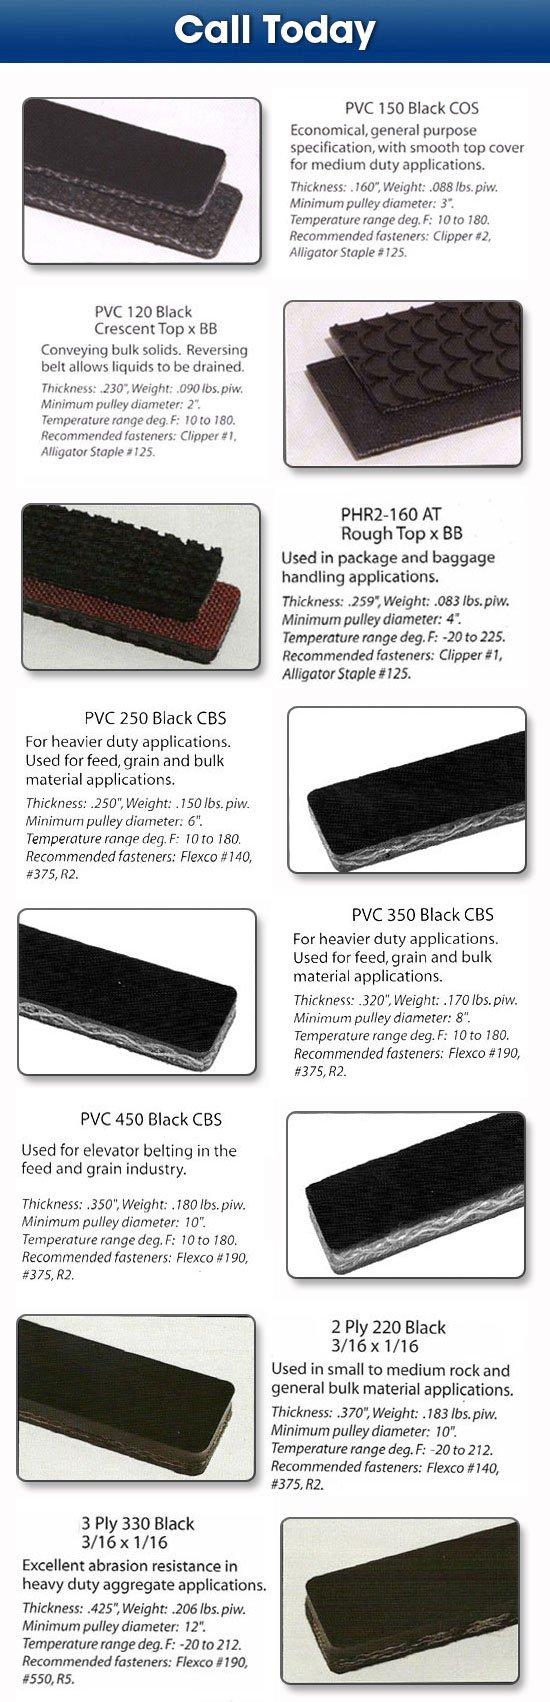 Lubbock, TX Material Handling-Deeco Hose & Belting-Conveying belts.